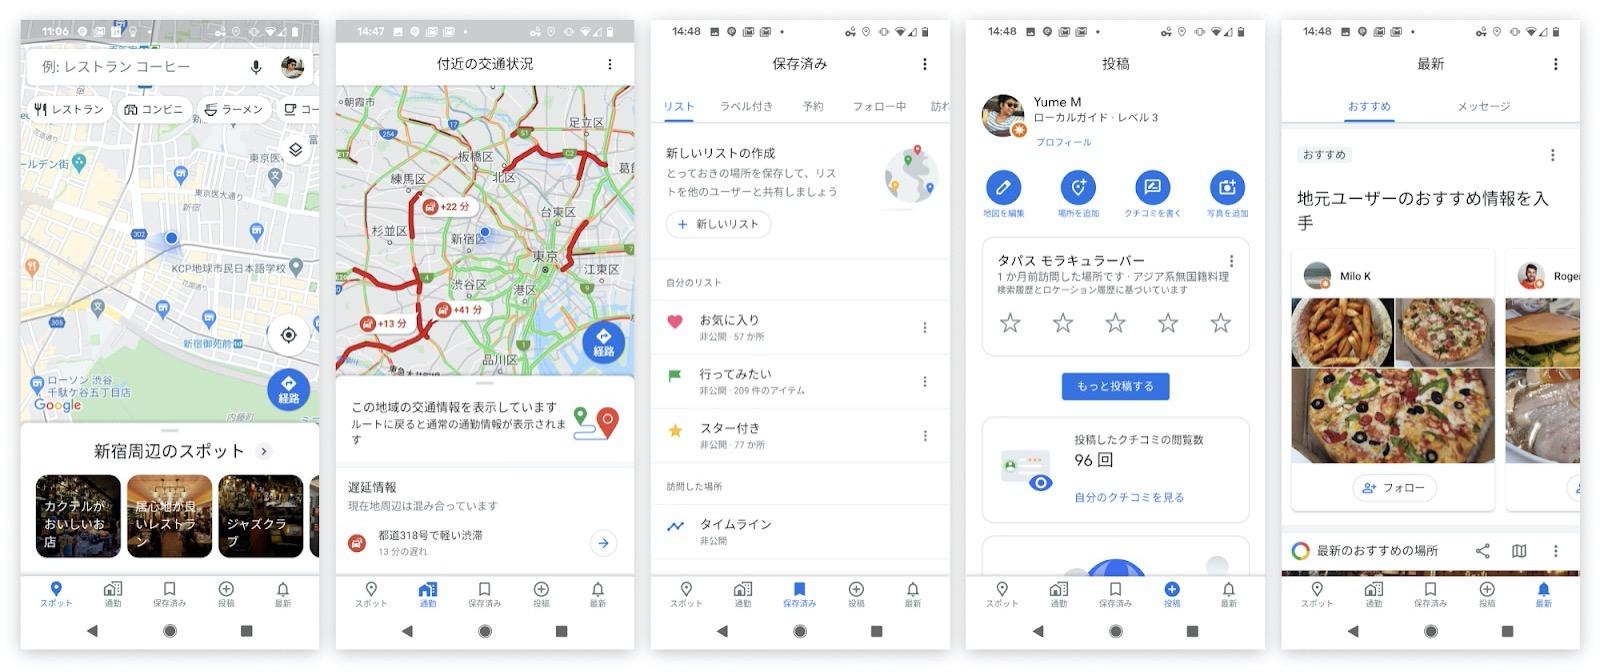 Google Maps 15th anniversary 00